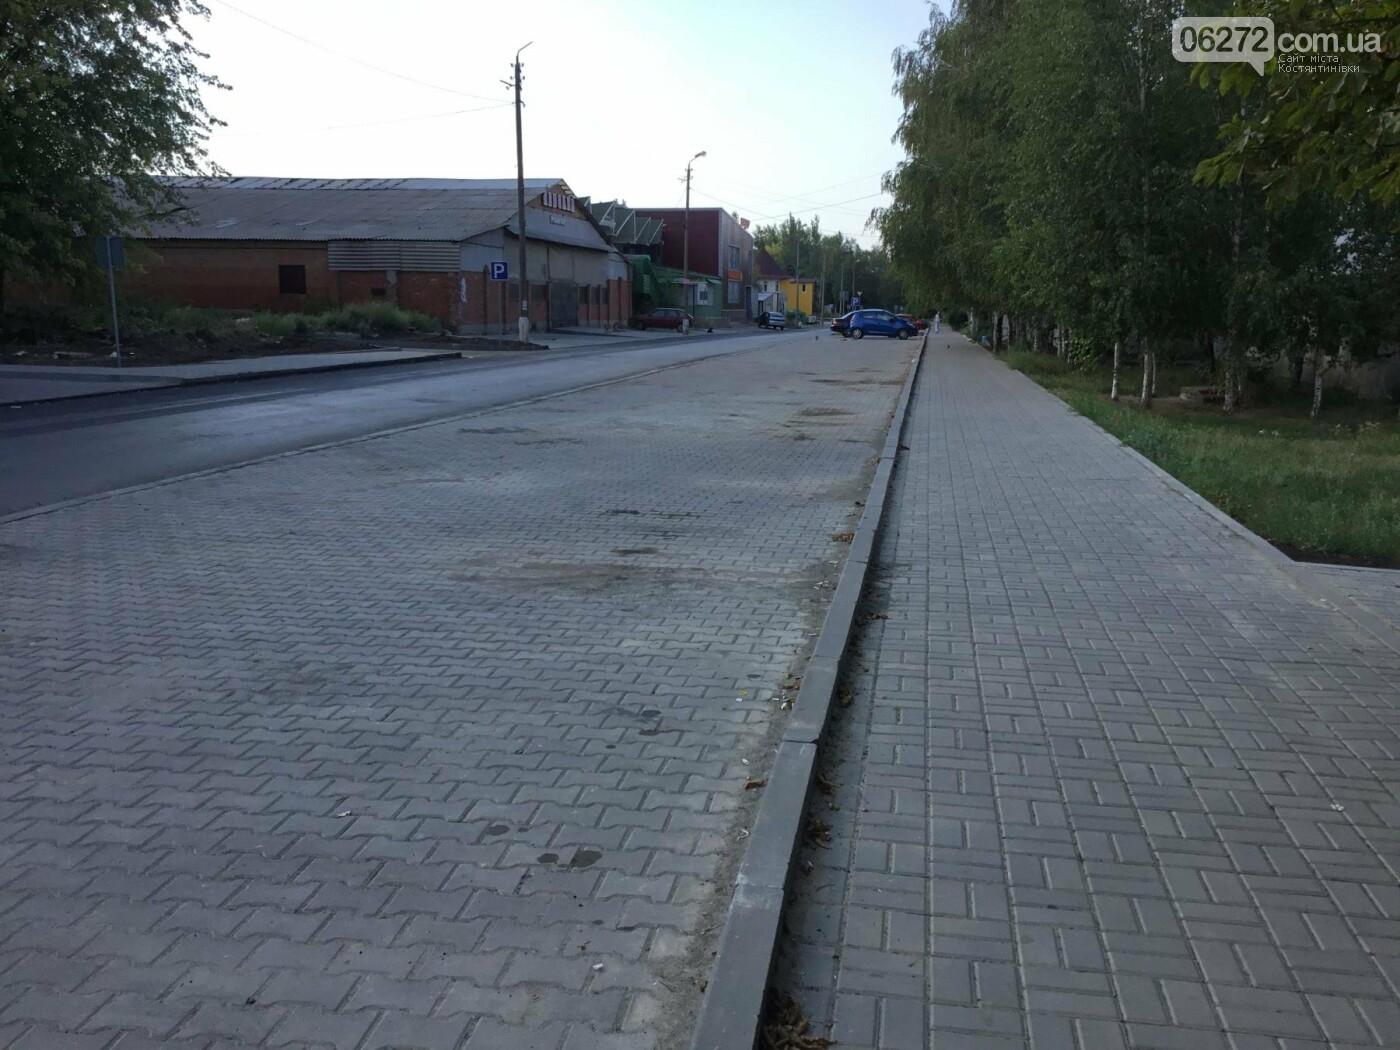 Дорога после ремонта по ул. Леваневского в Константиновке, фото-1